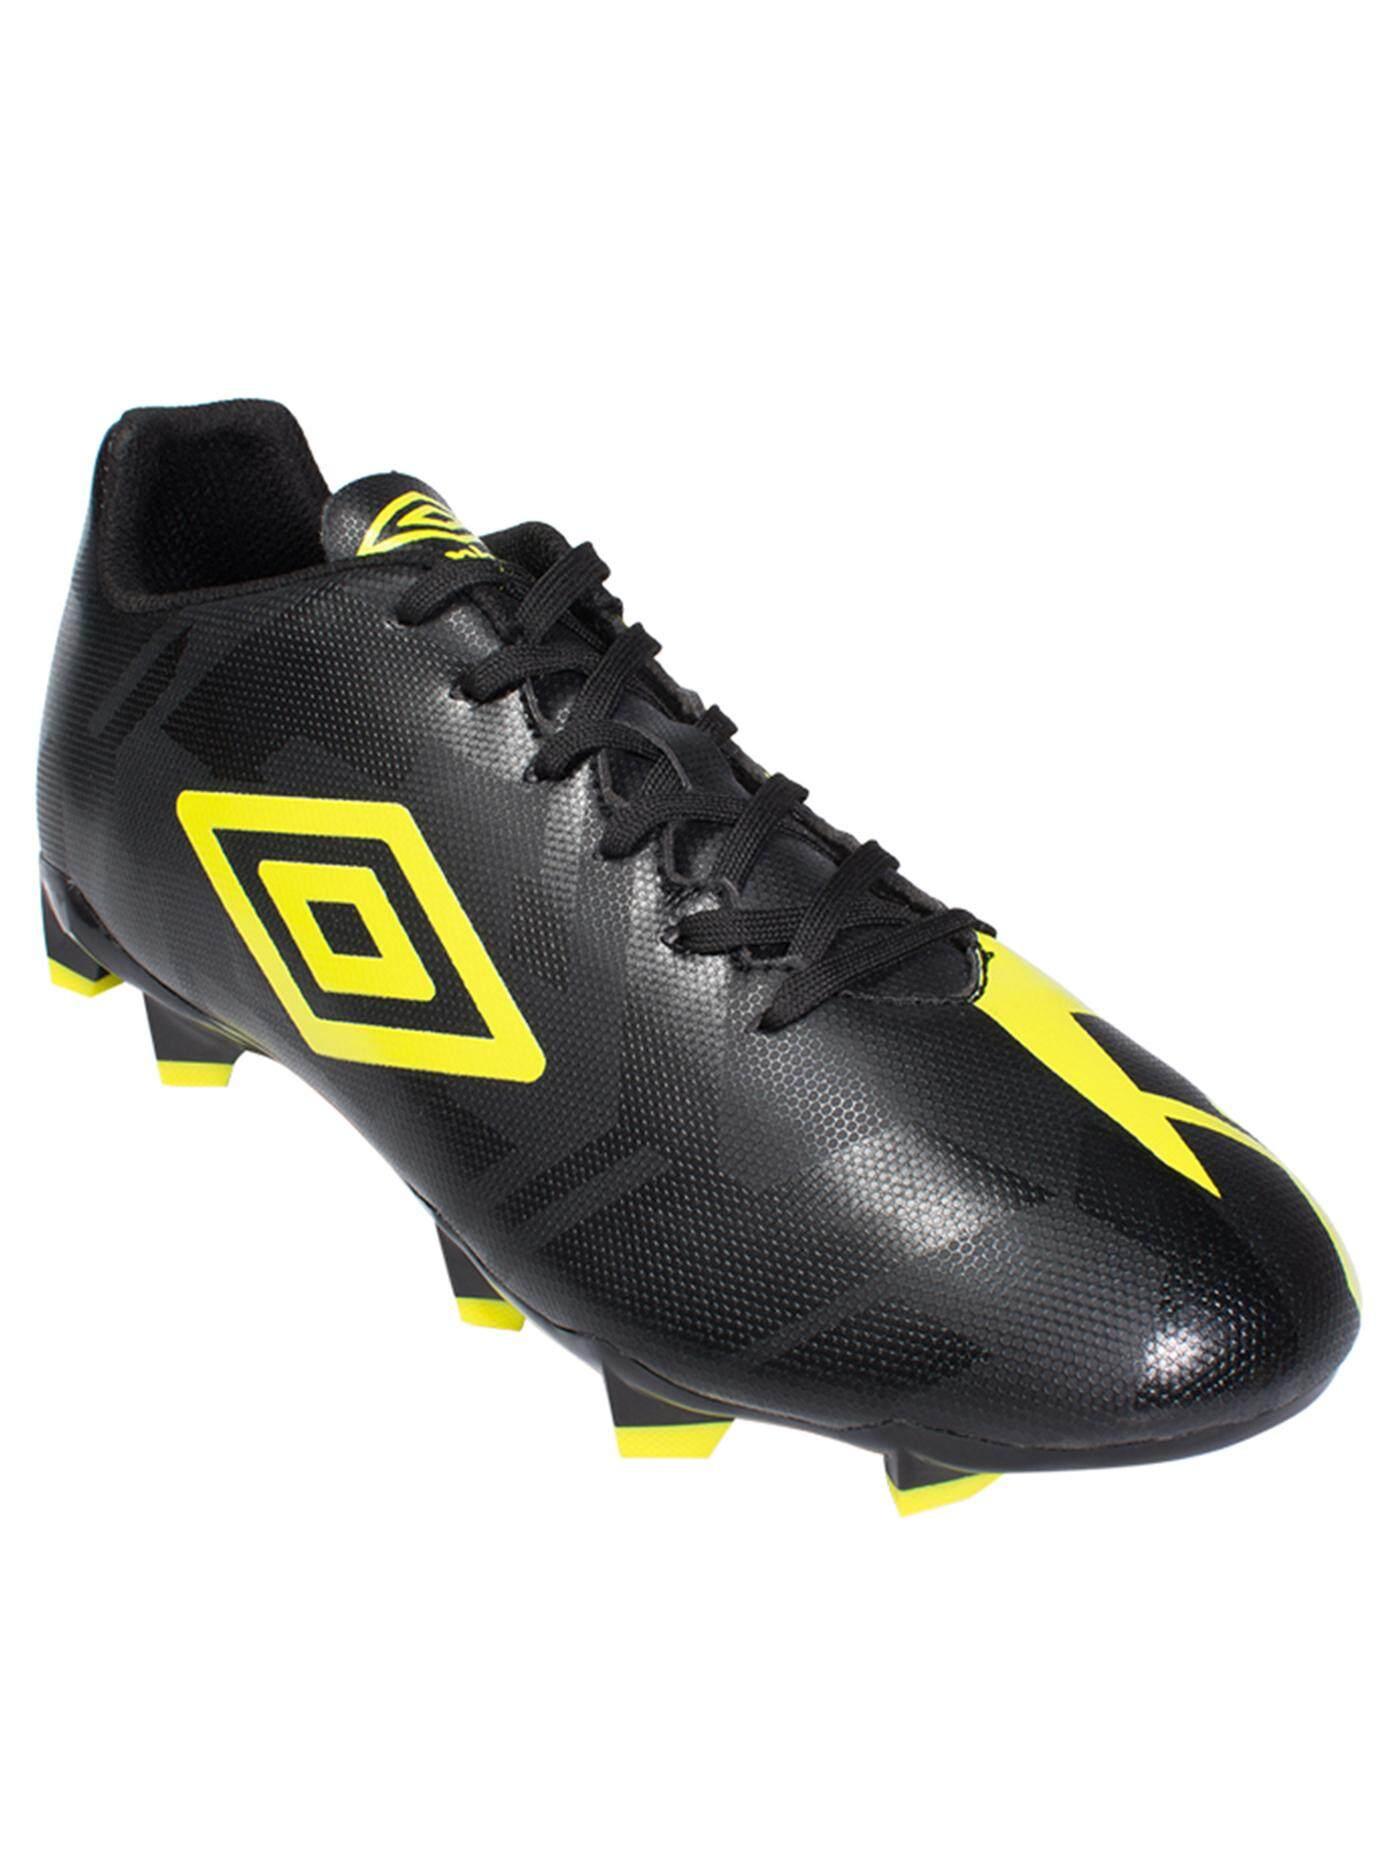 Umbro รองเท้าฟุตบอลผู้ชาย Veloce 4 Fg 81415u-Gjv ไซส์ Us7_สีดำ By We Have Item.